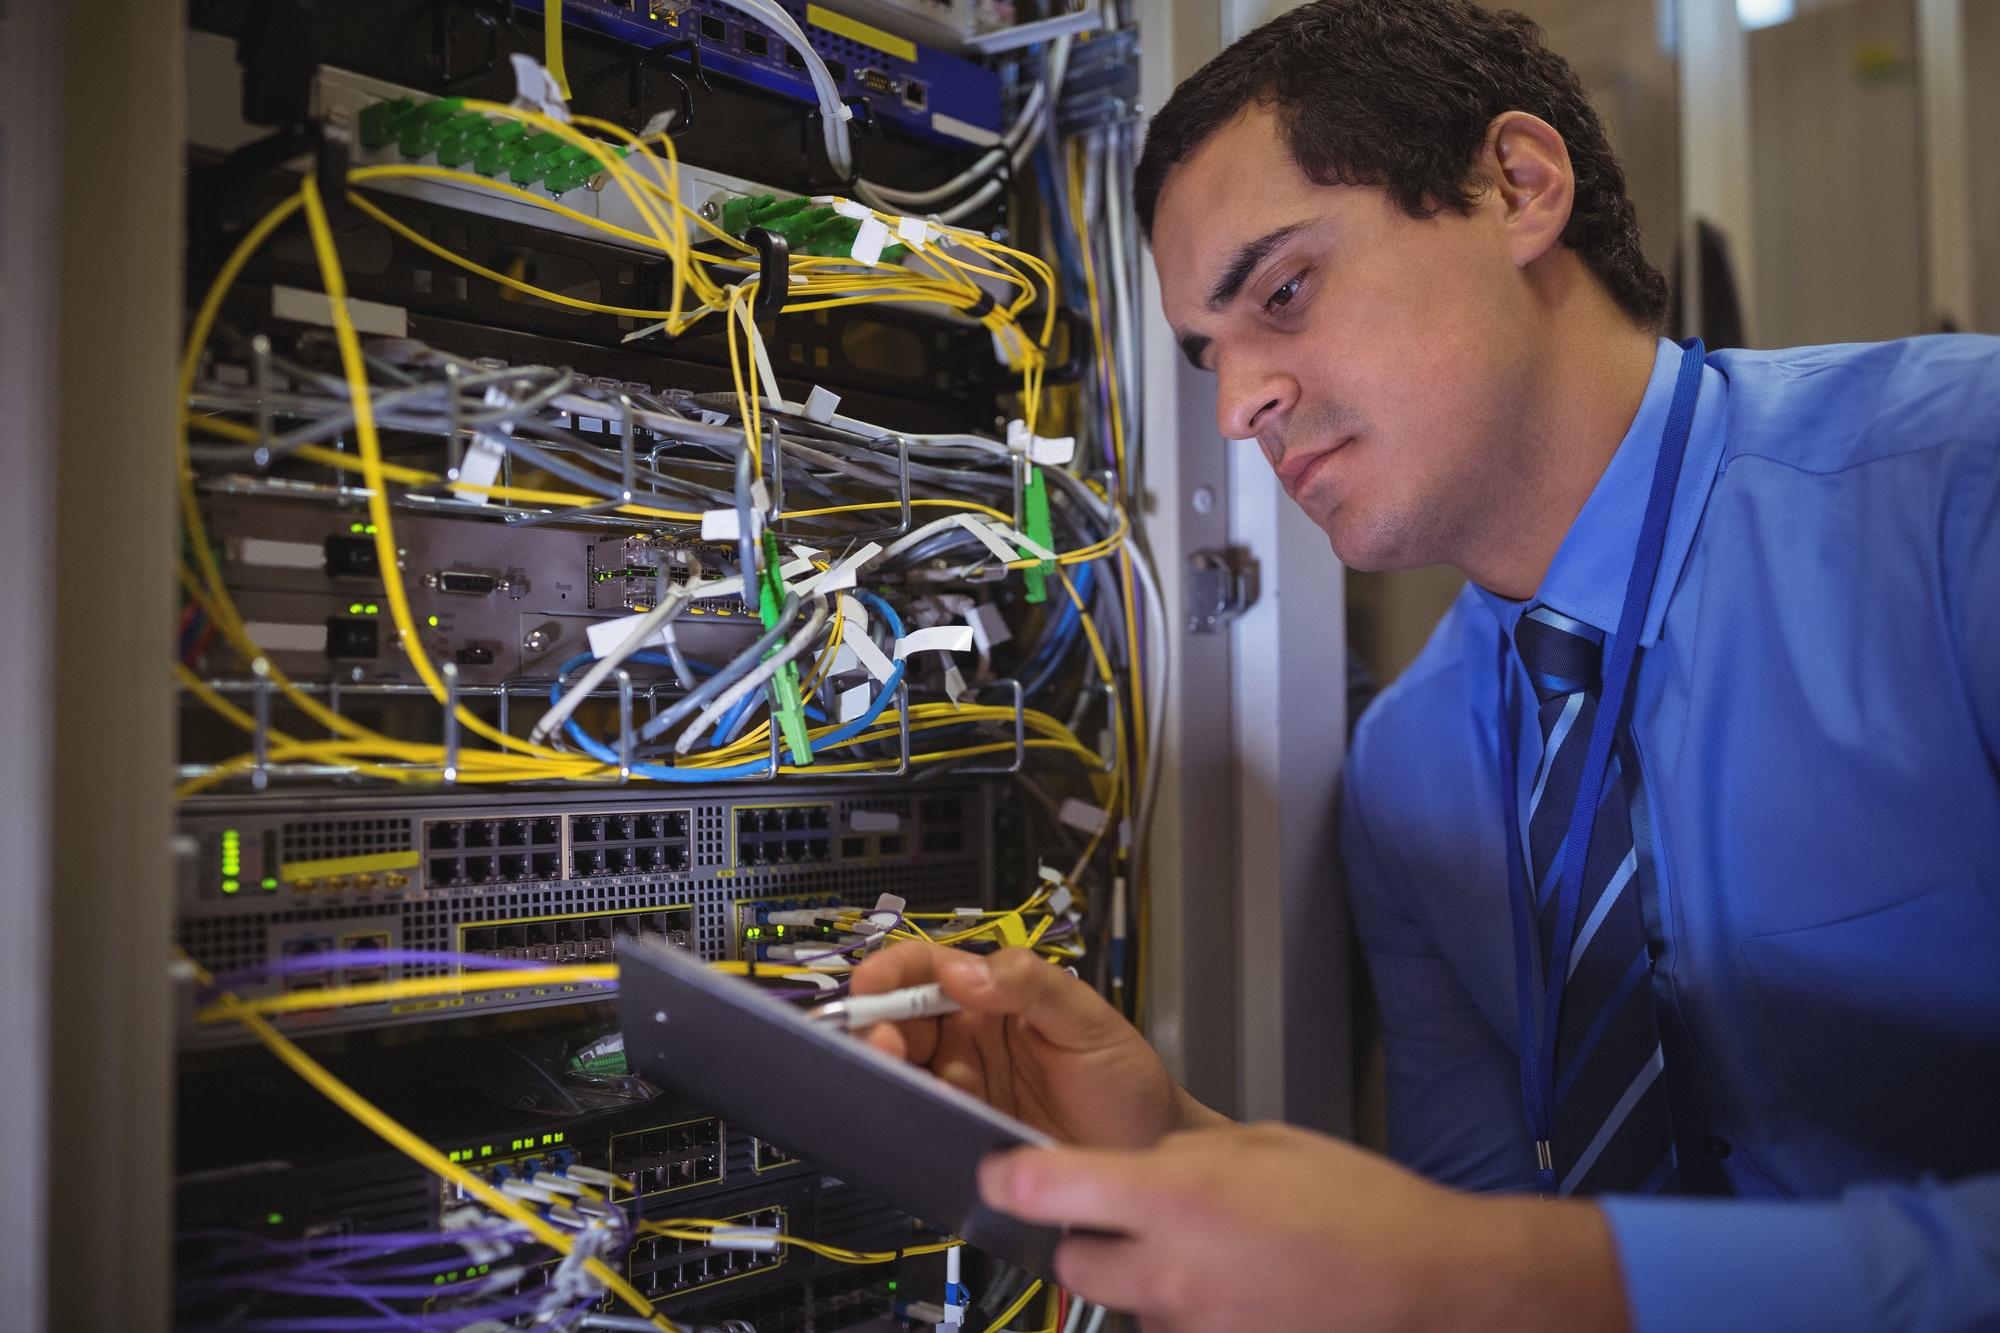 12 Point Server Maintenance Checklist for Modern Data Centers